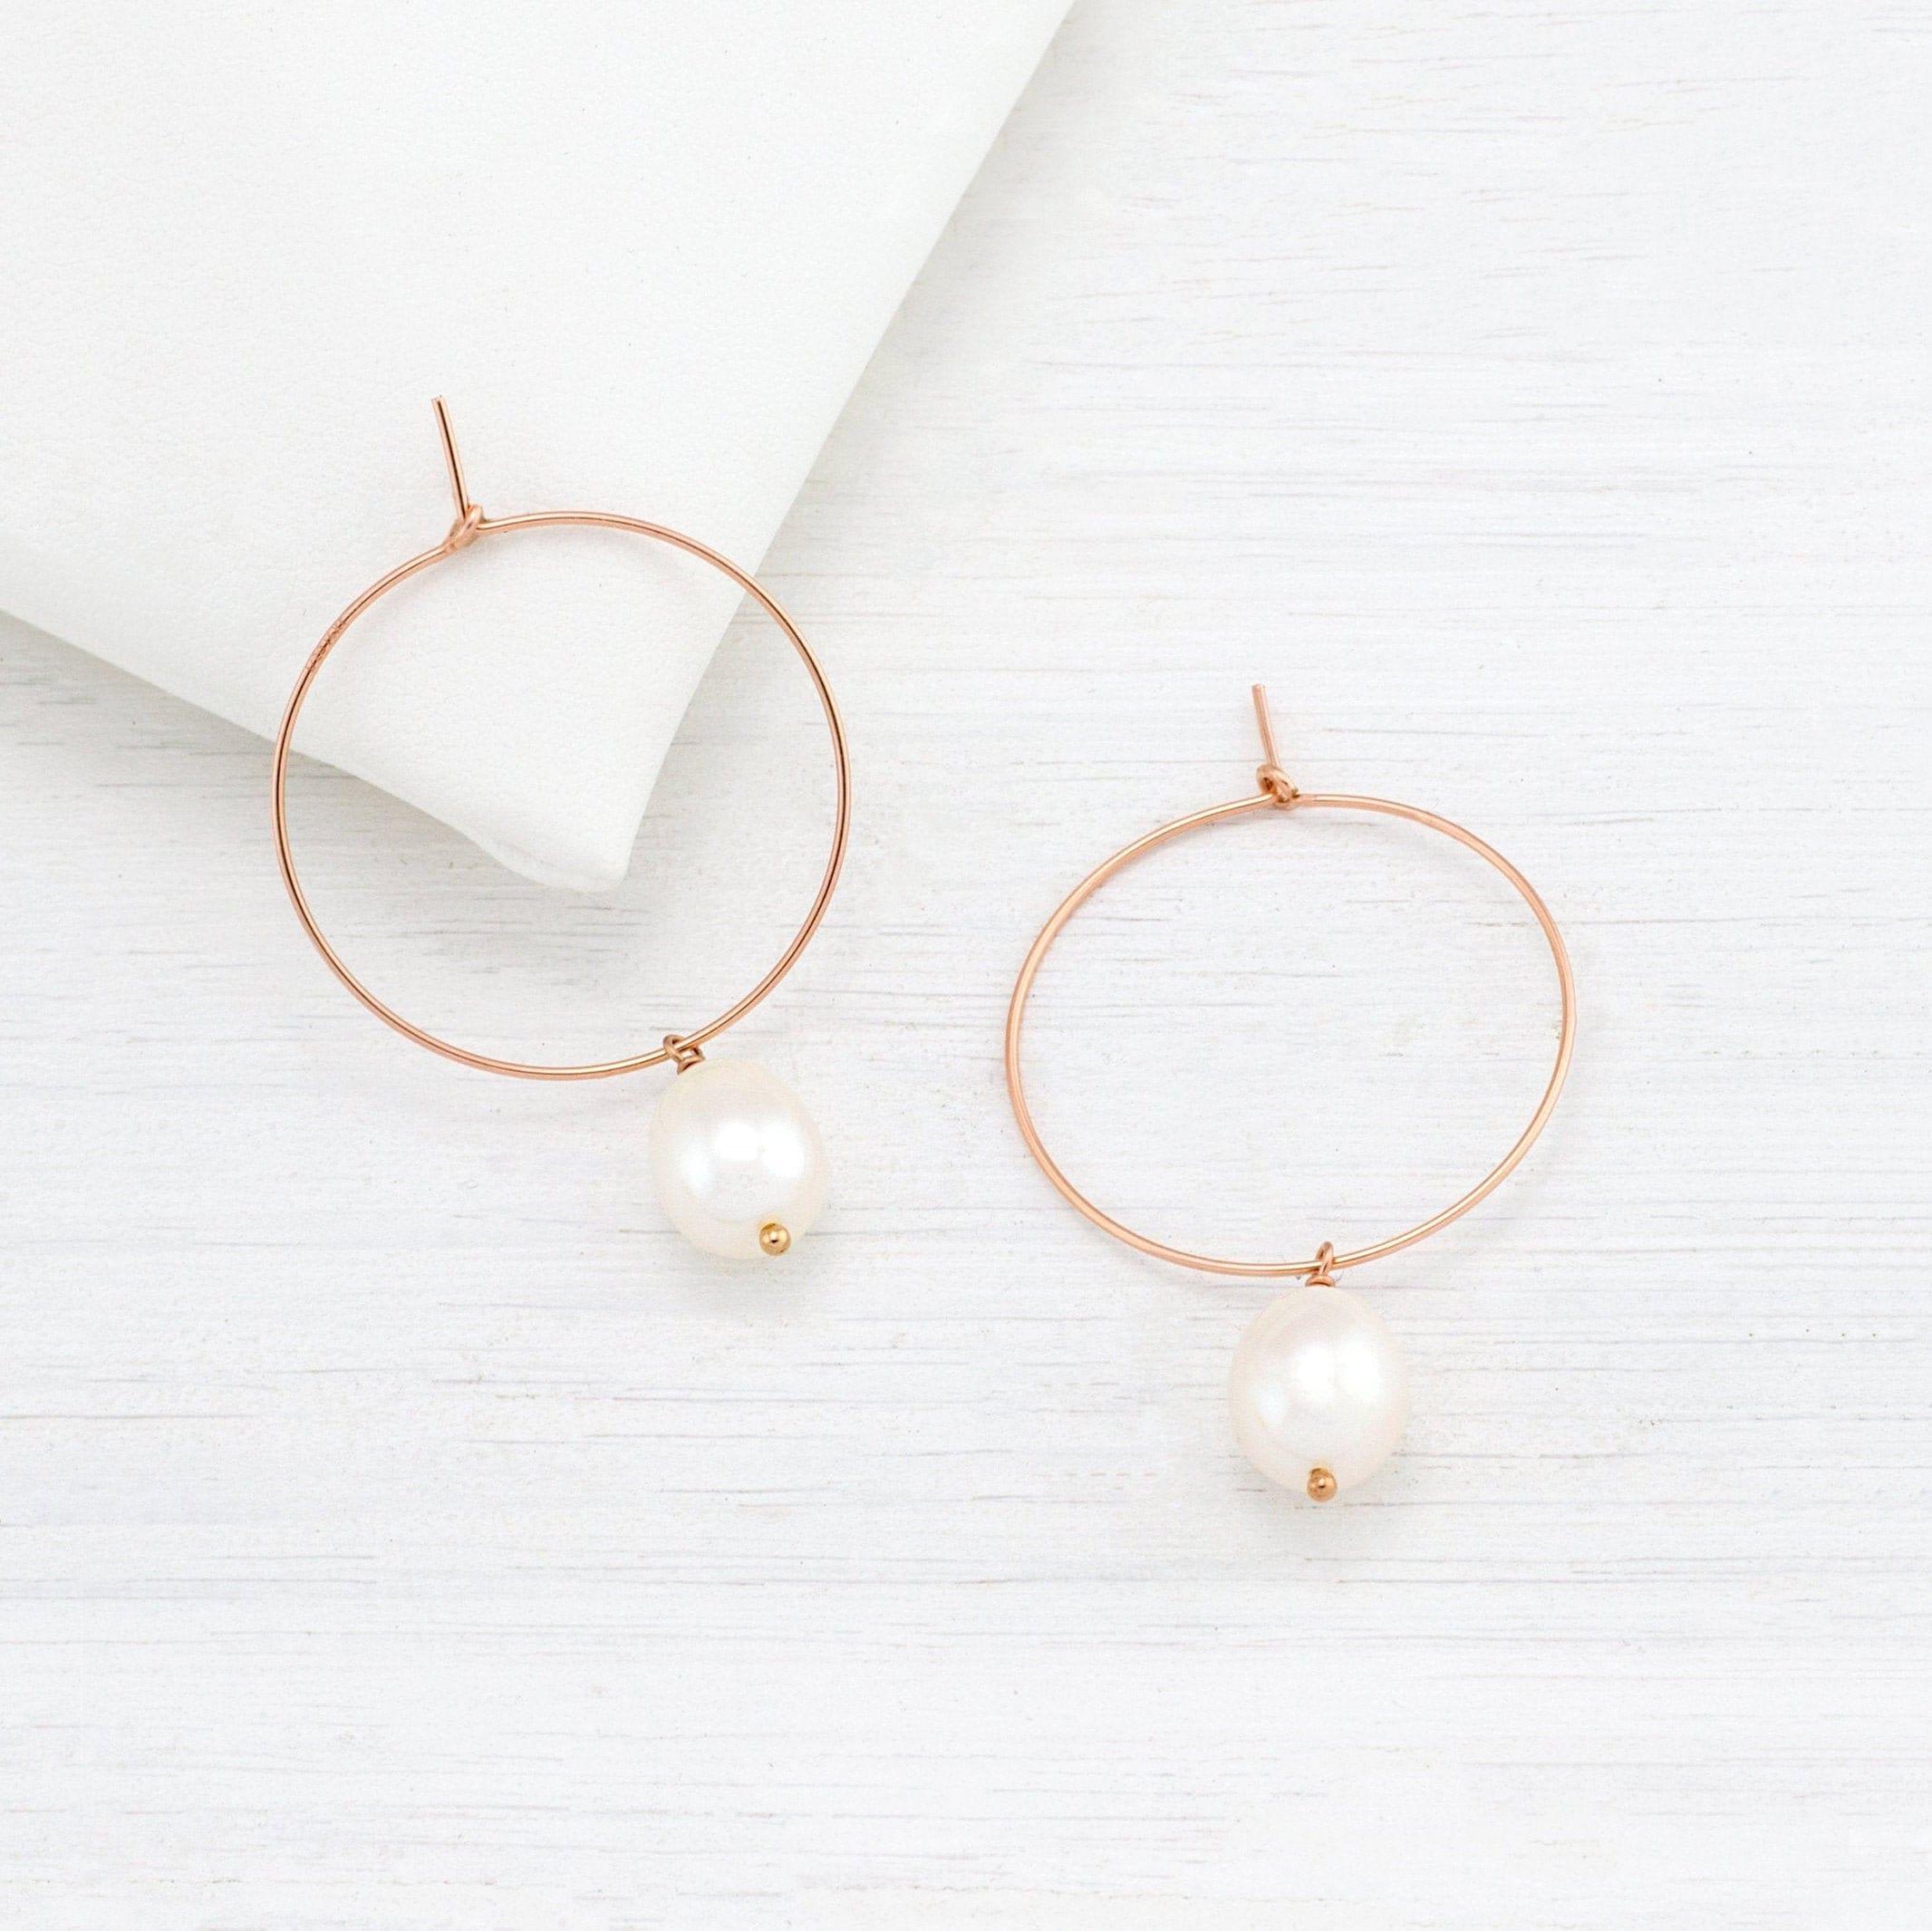 Pearl Bridal Jewelry White Pearl Earrings Bridal Earrings Gold Filled Earrings White Freshwater Pearl Earrings Gold Circle Earrings